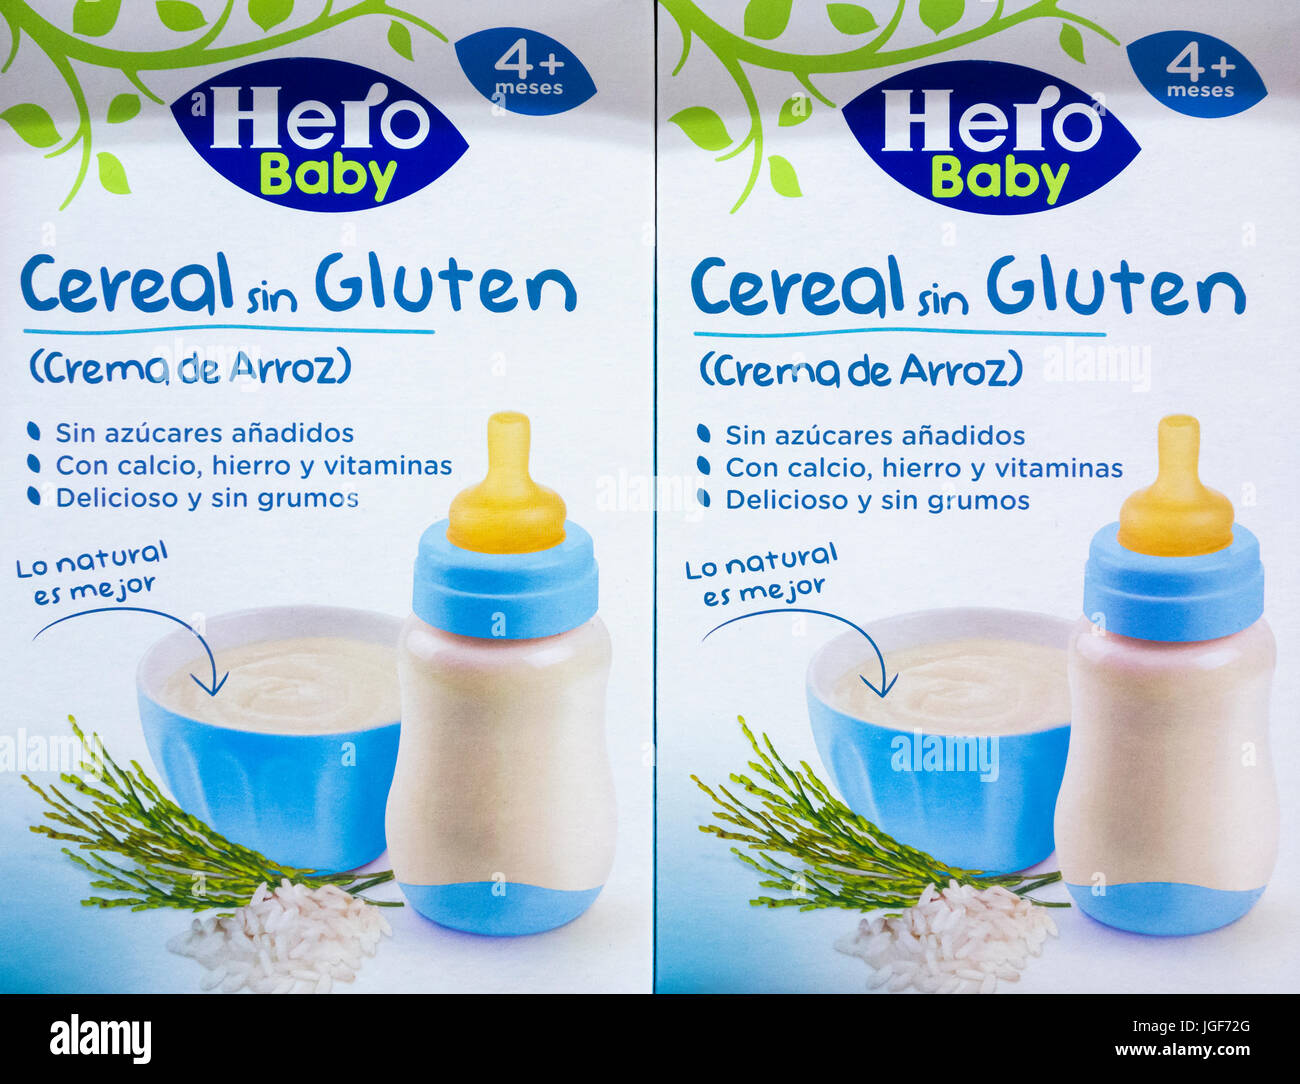 Gluten free (sin gluten in Spanish) Hero brand baby food in Spanish supermarket. - Stock Image